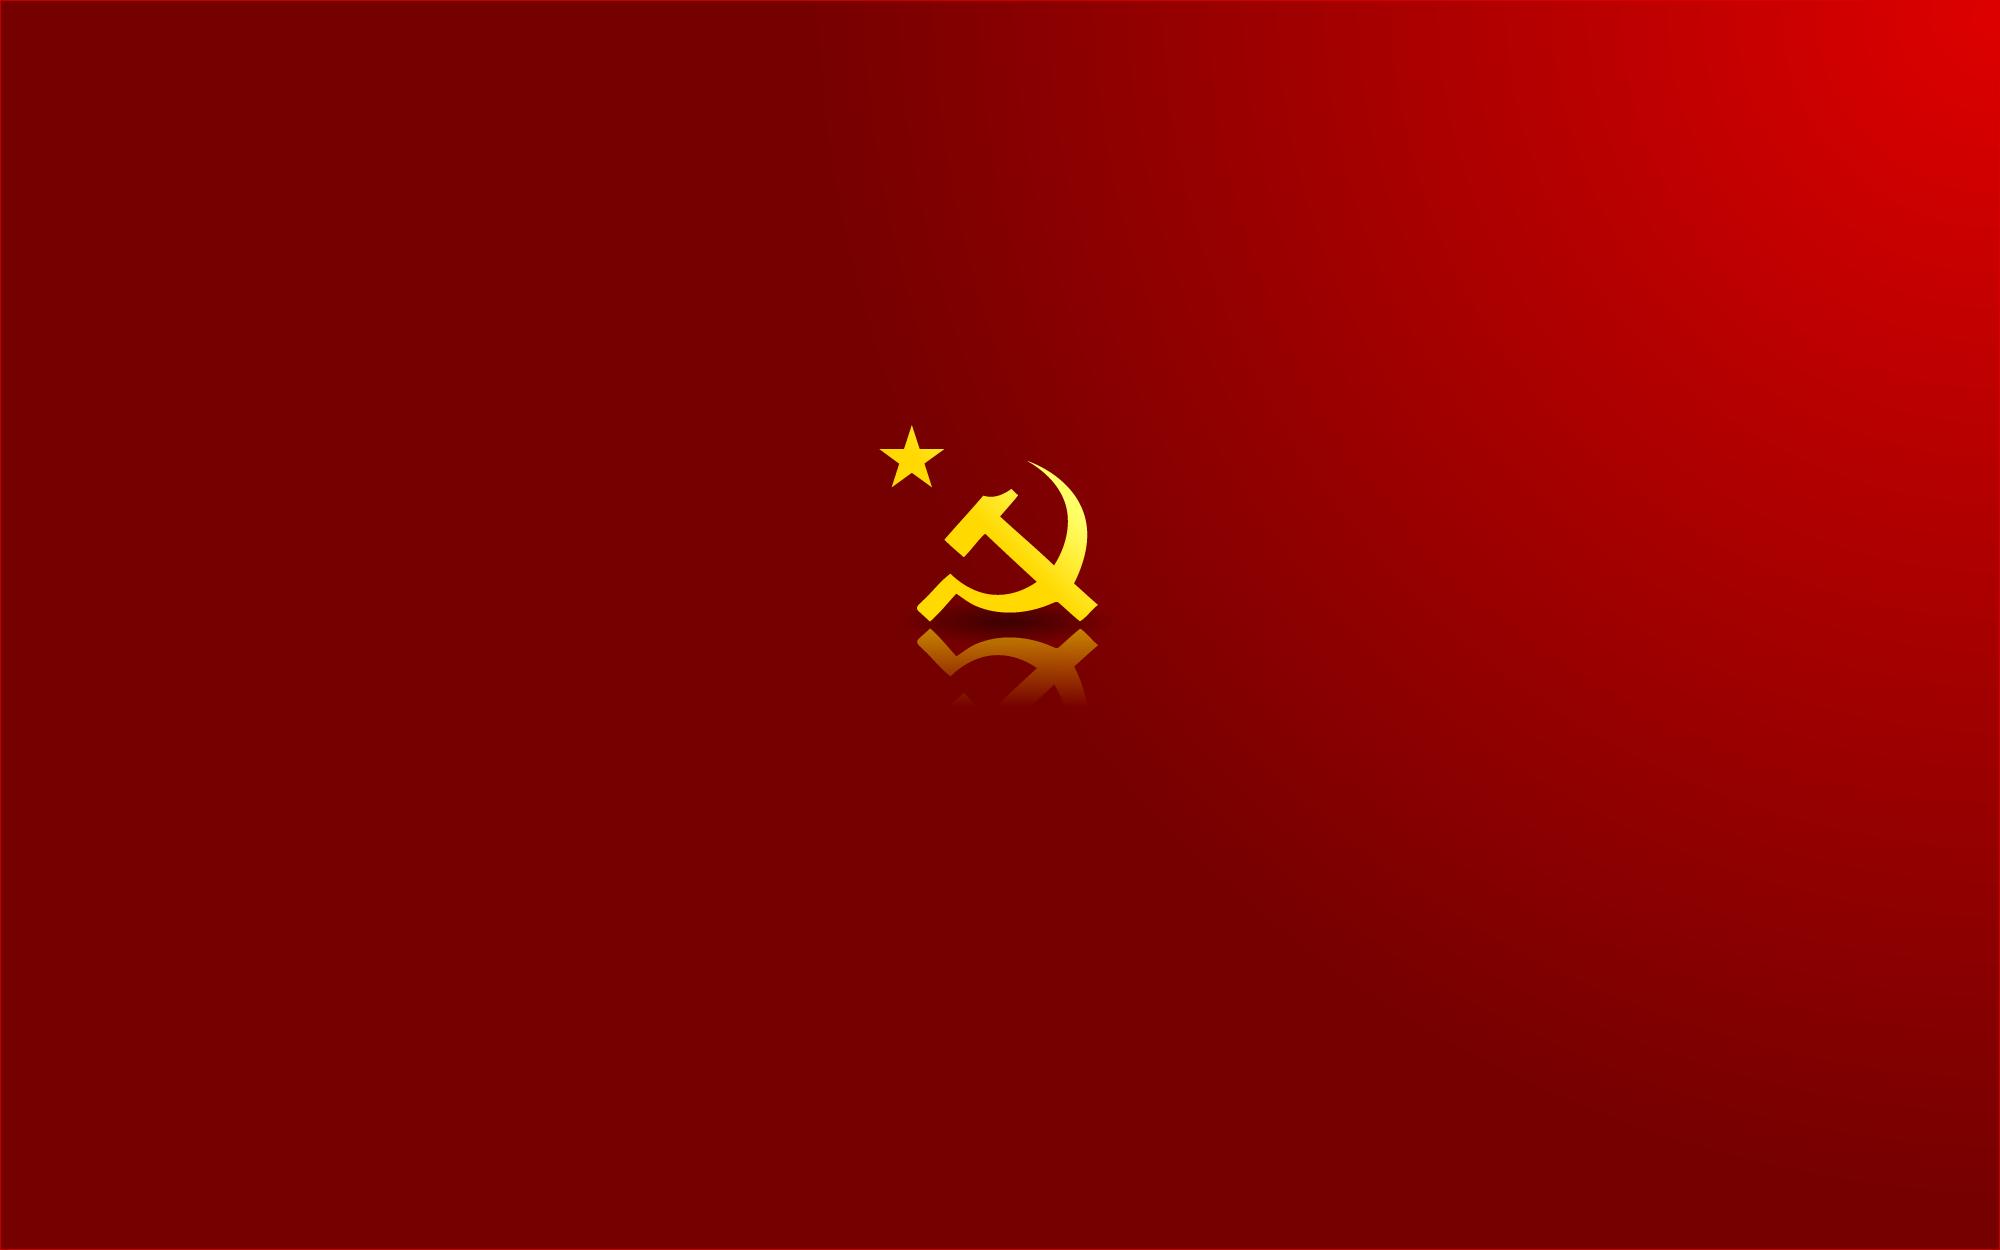 Soviet Wallpaper HD - WallpaperSafari